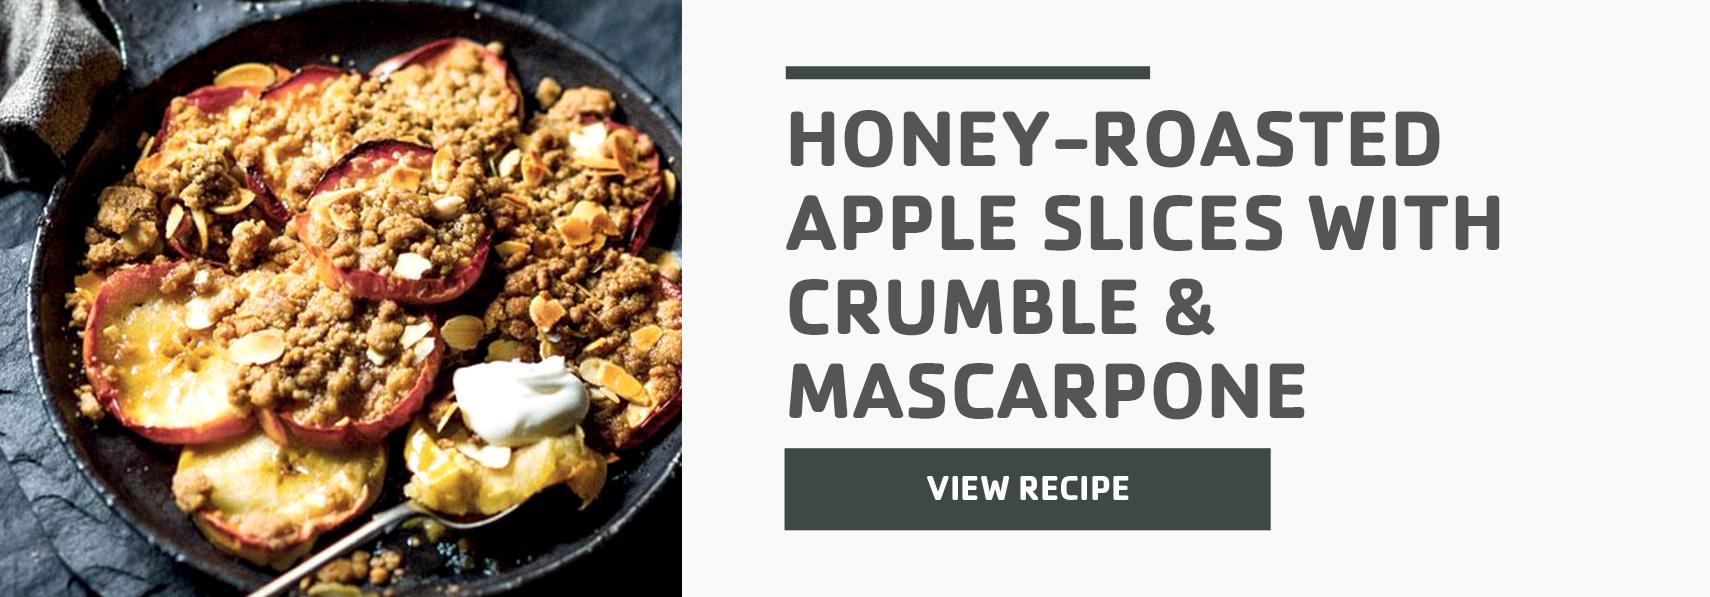 Honey-roasted-Apple-Slices-with-Crumble-&-Mascarpone.jpg